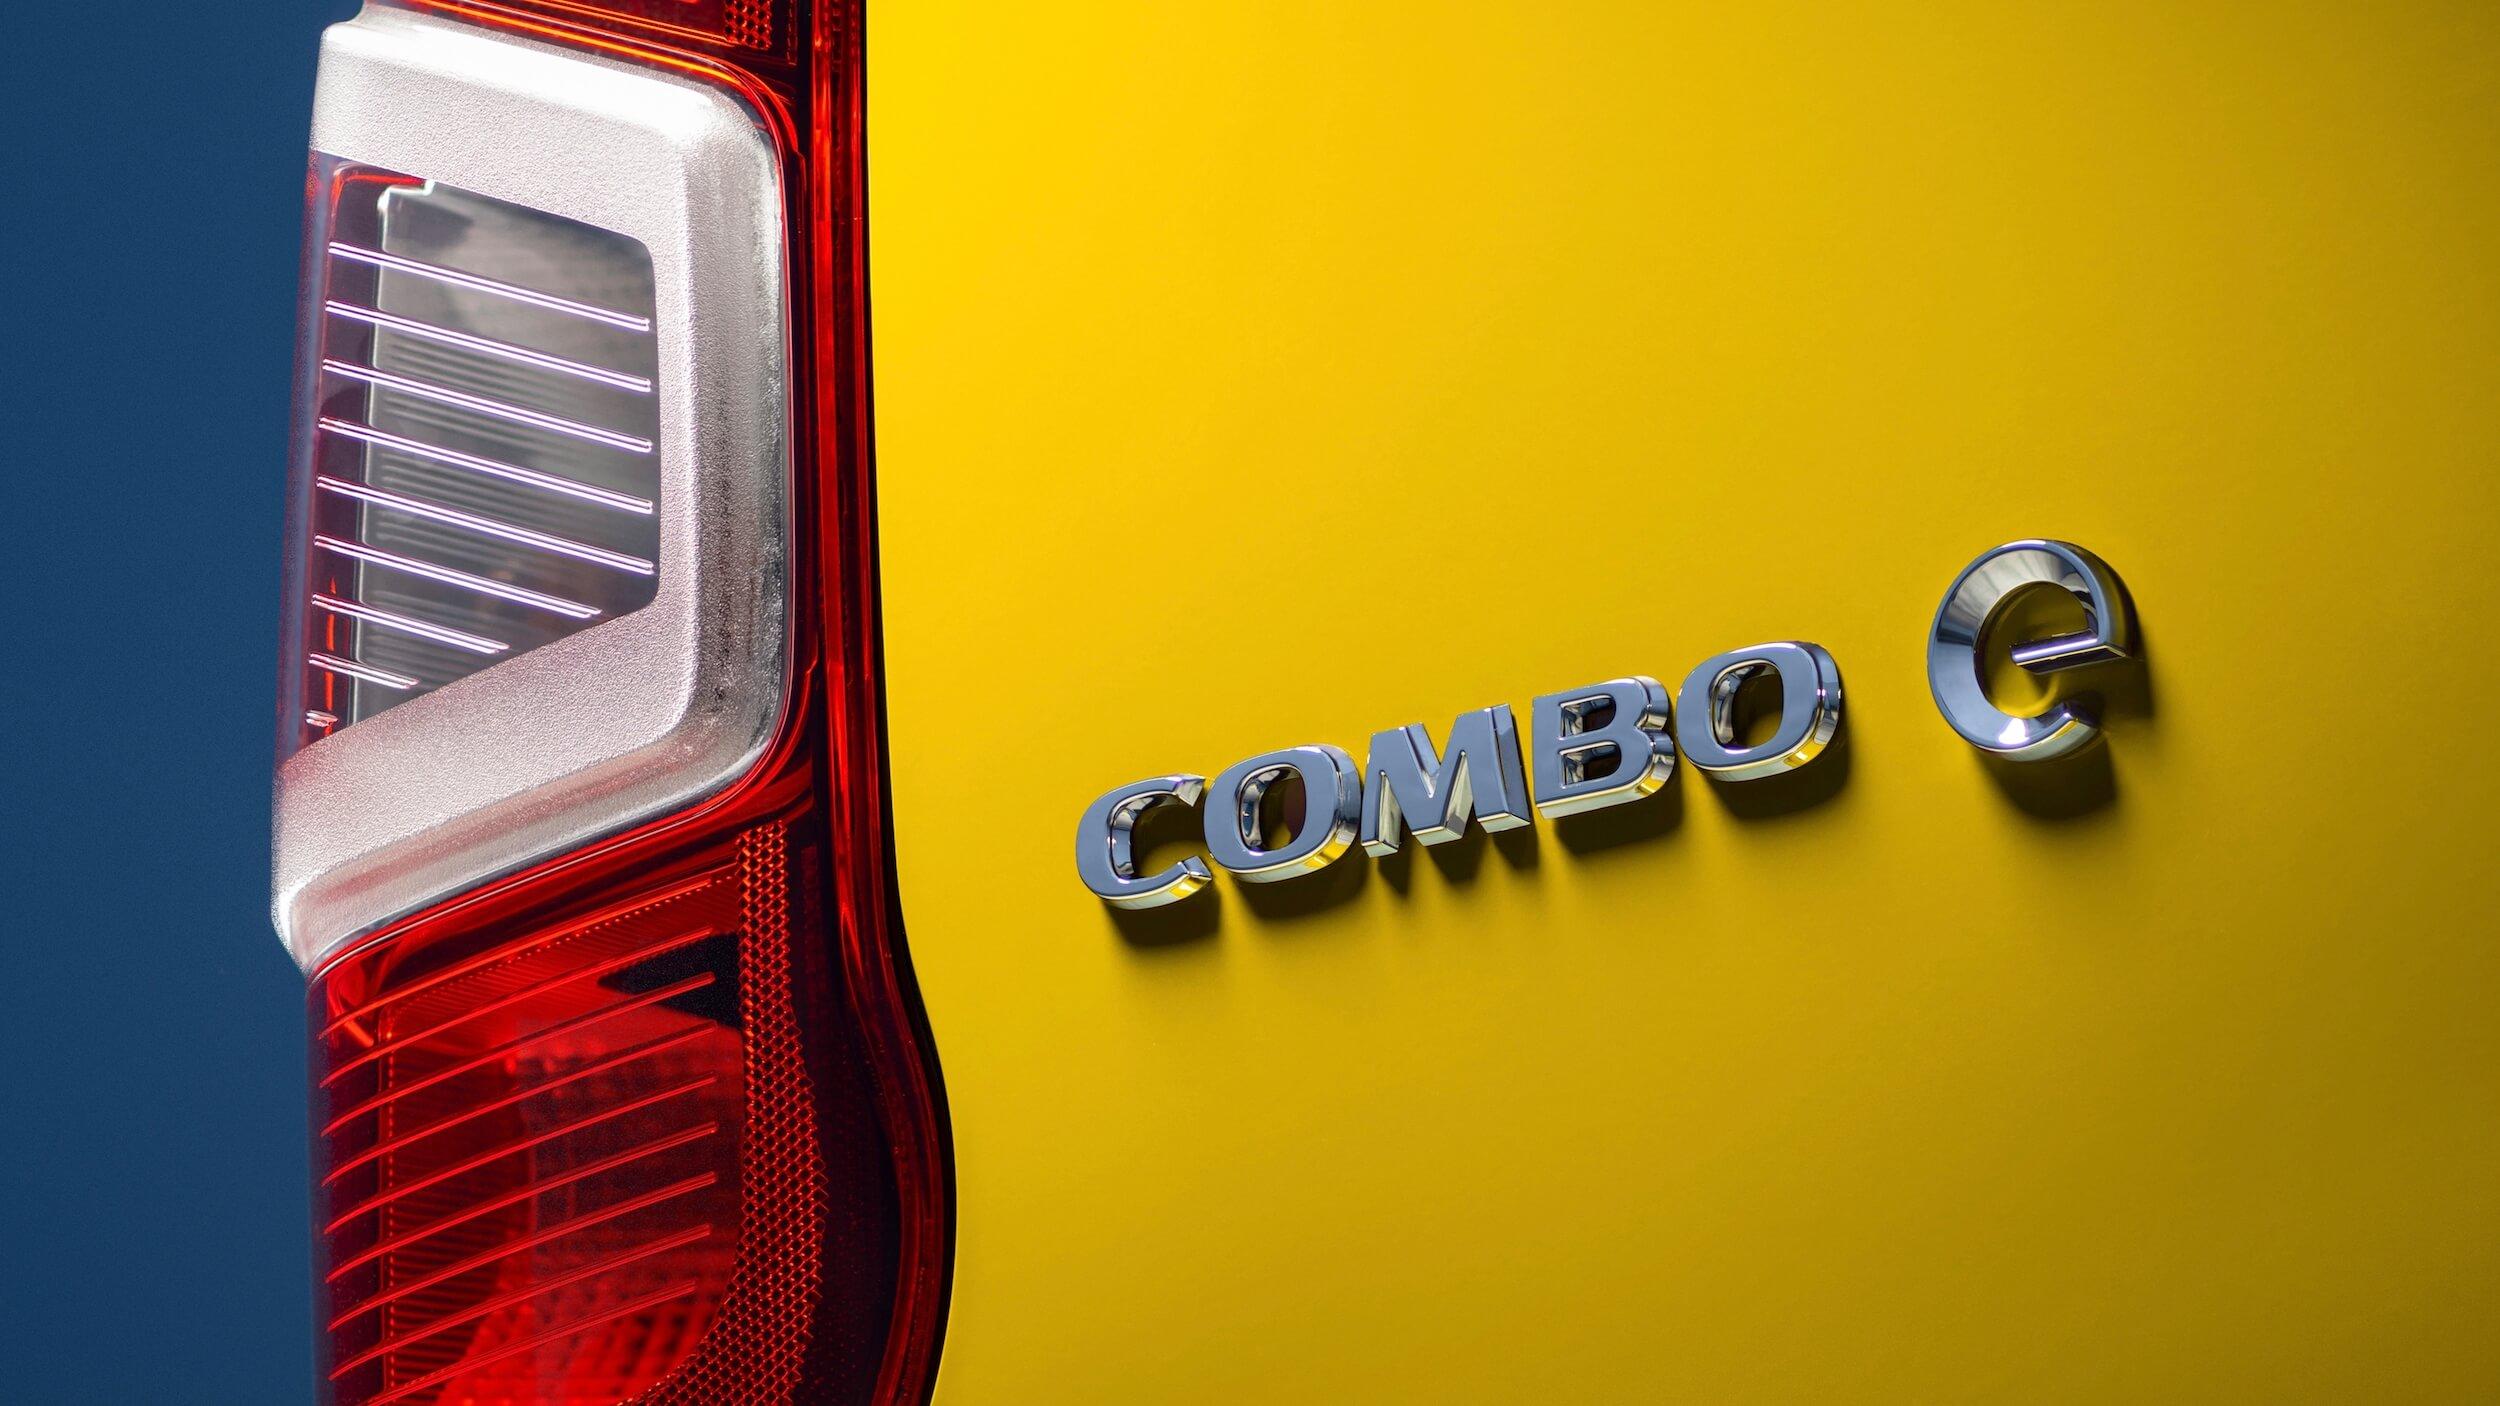 Opel Combo e Cargo badge